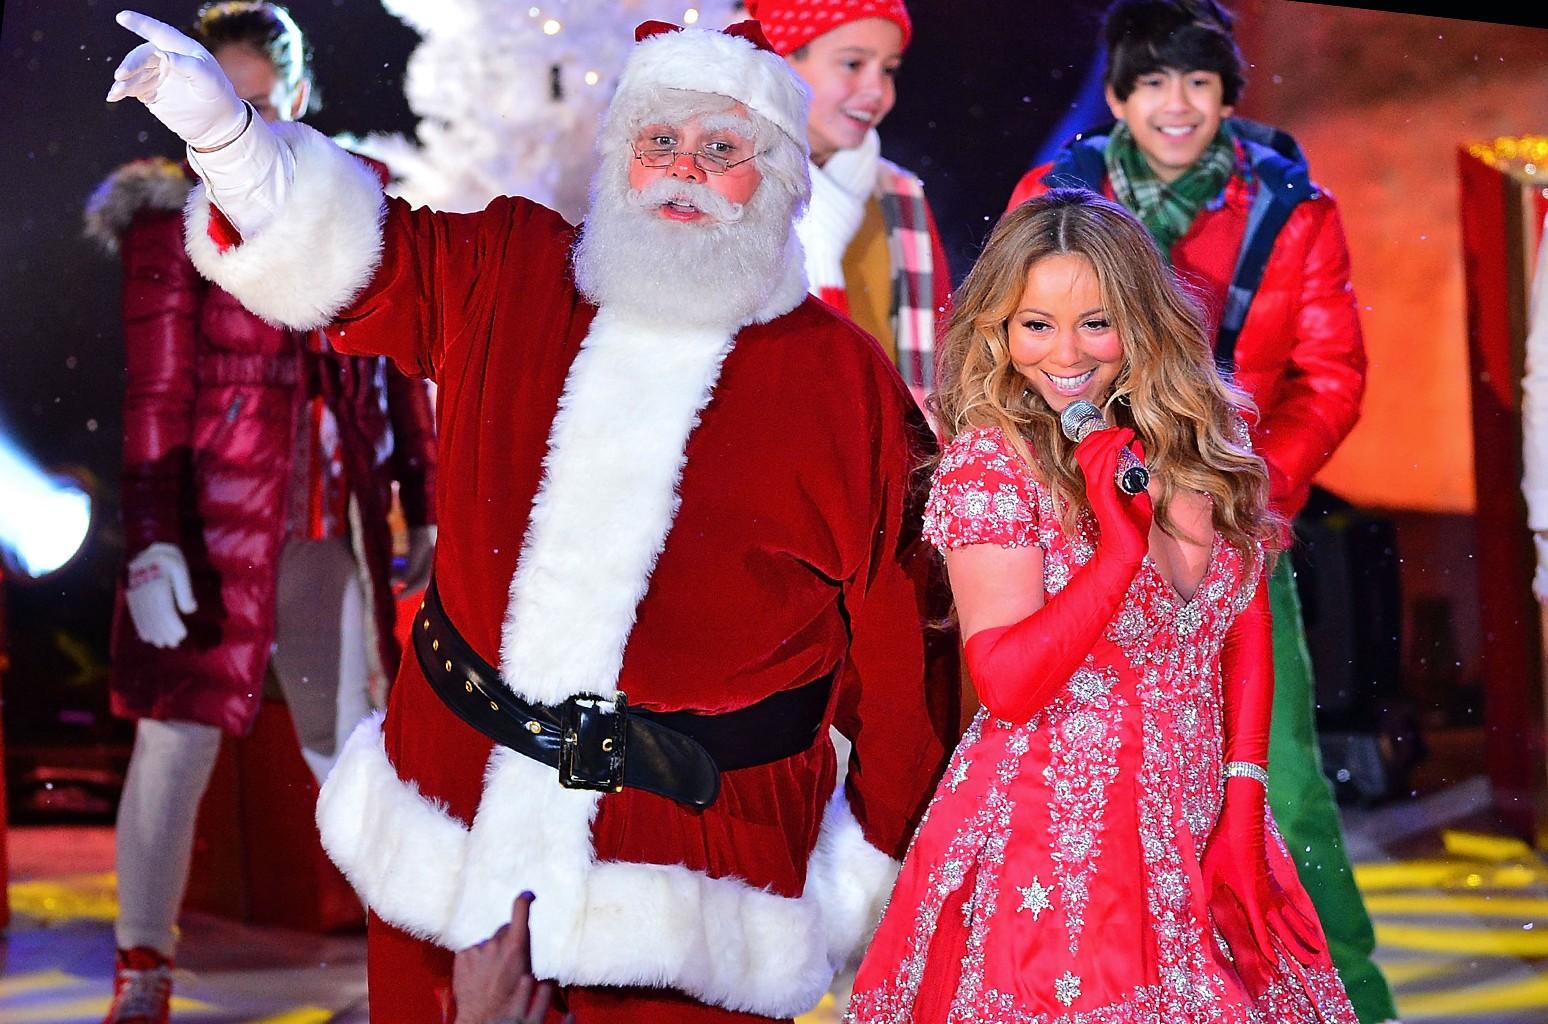 Billboard's Top 10 Most Popular Holiday Songs | Billboard